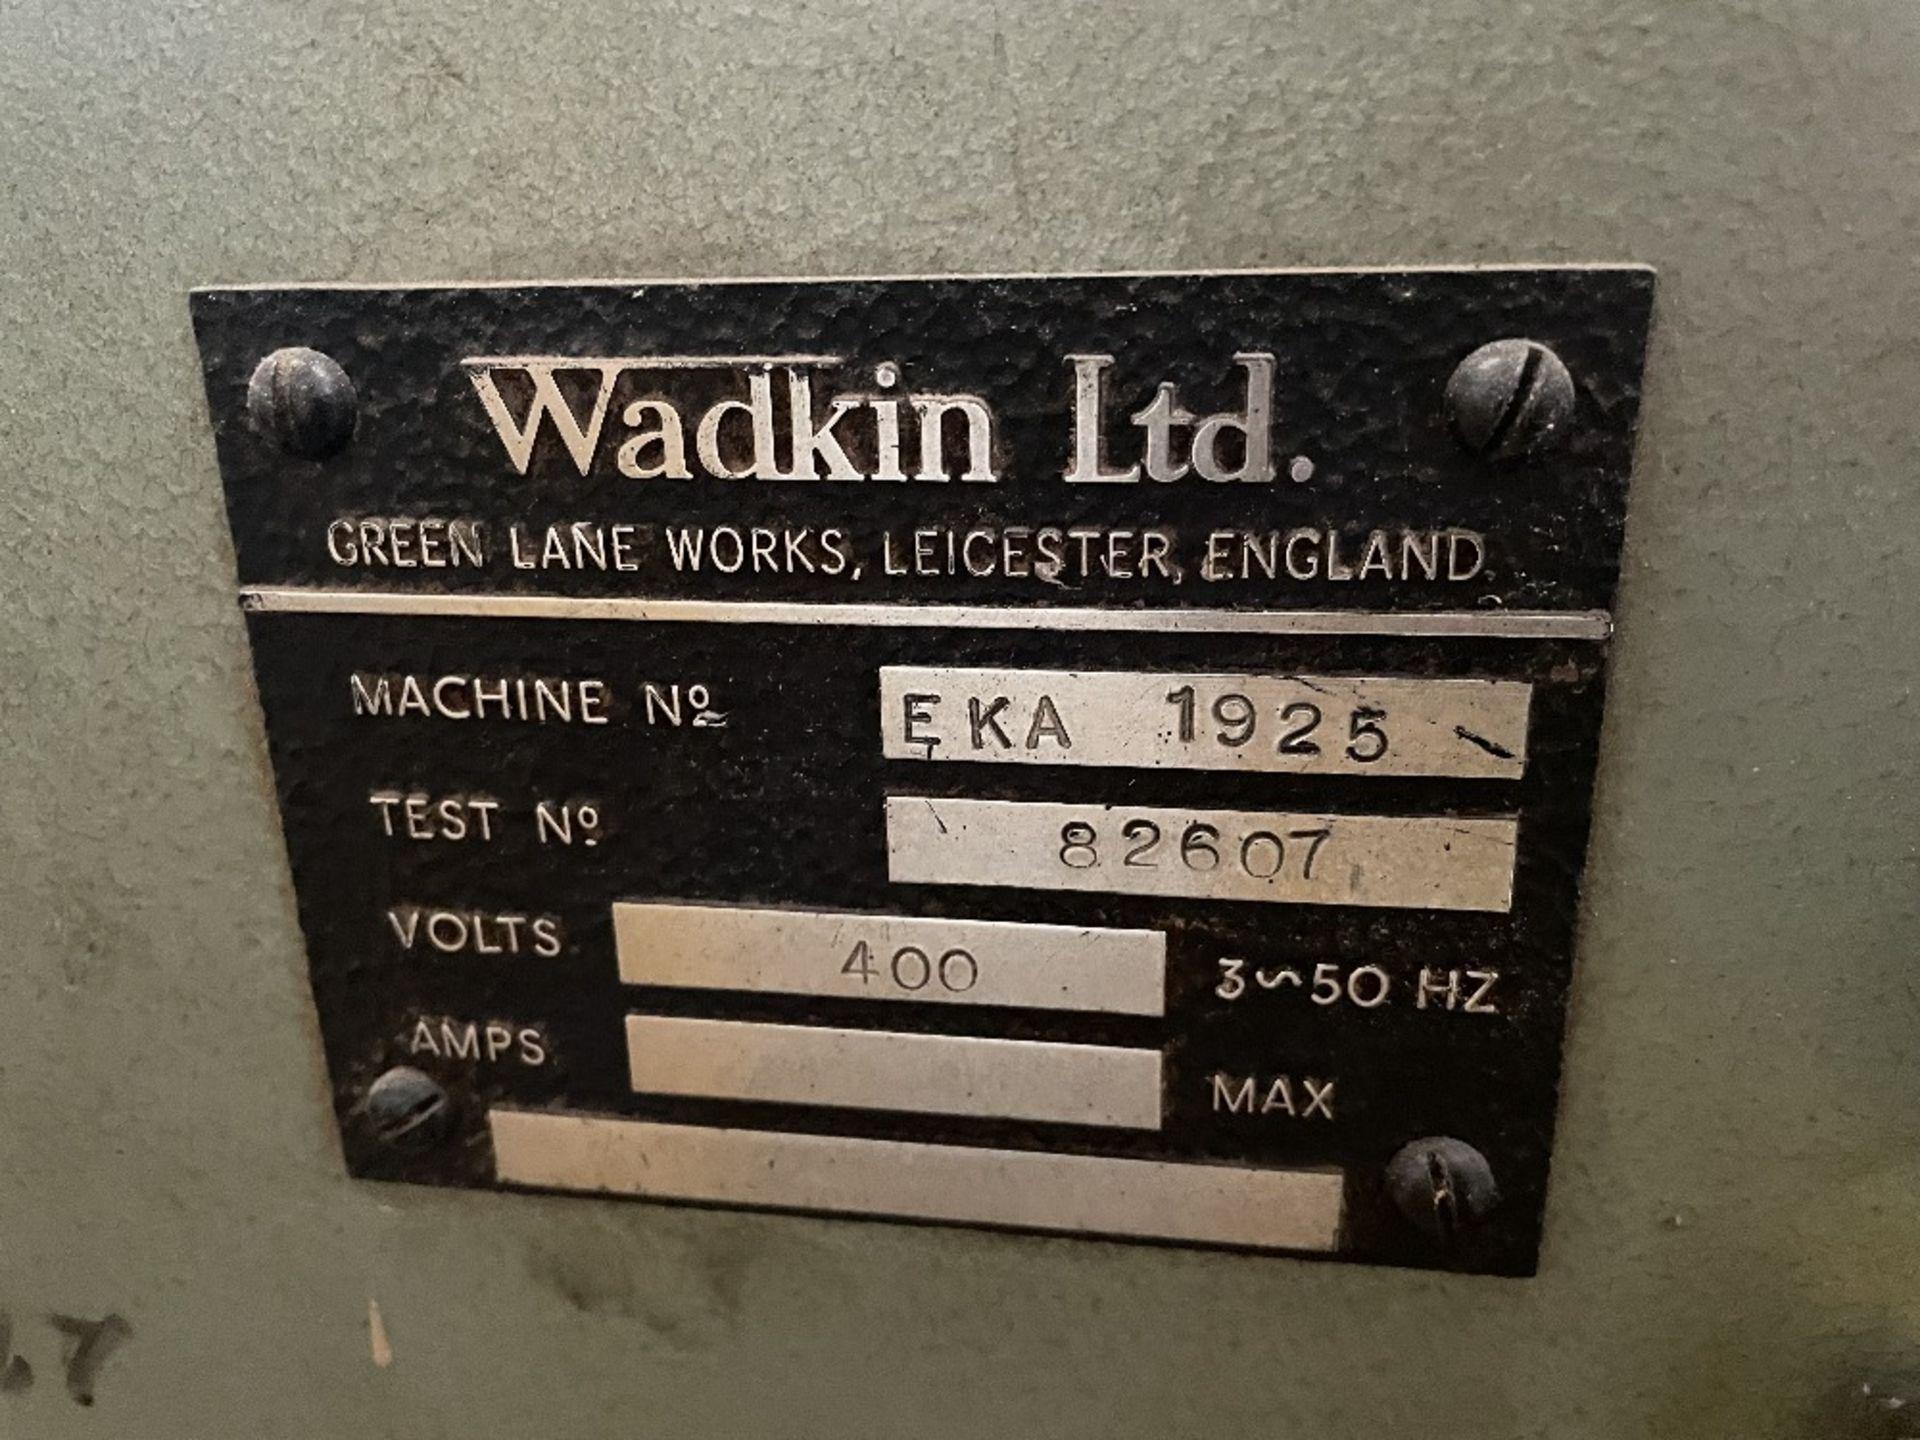 Wadkin EKA Single Head Tenoner - Image 4 of 7